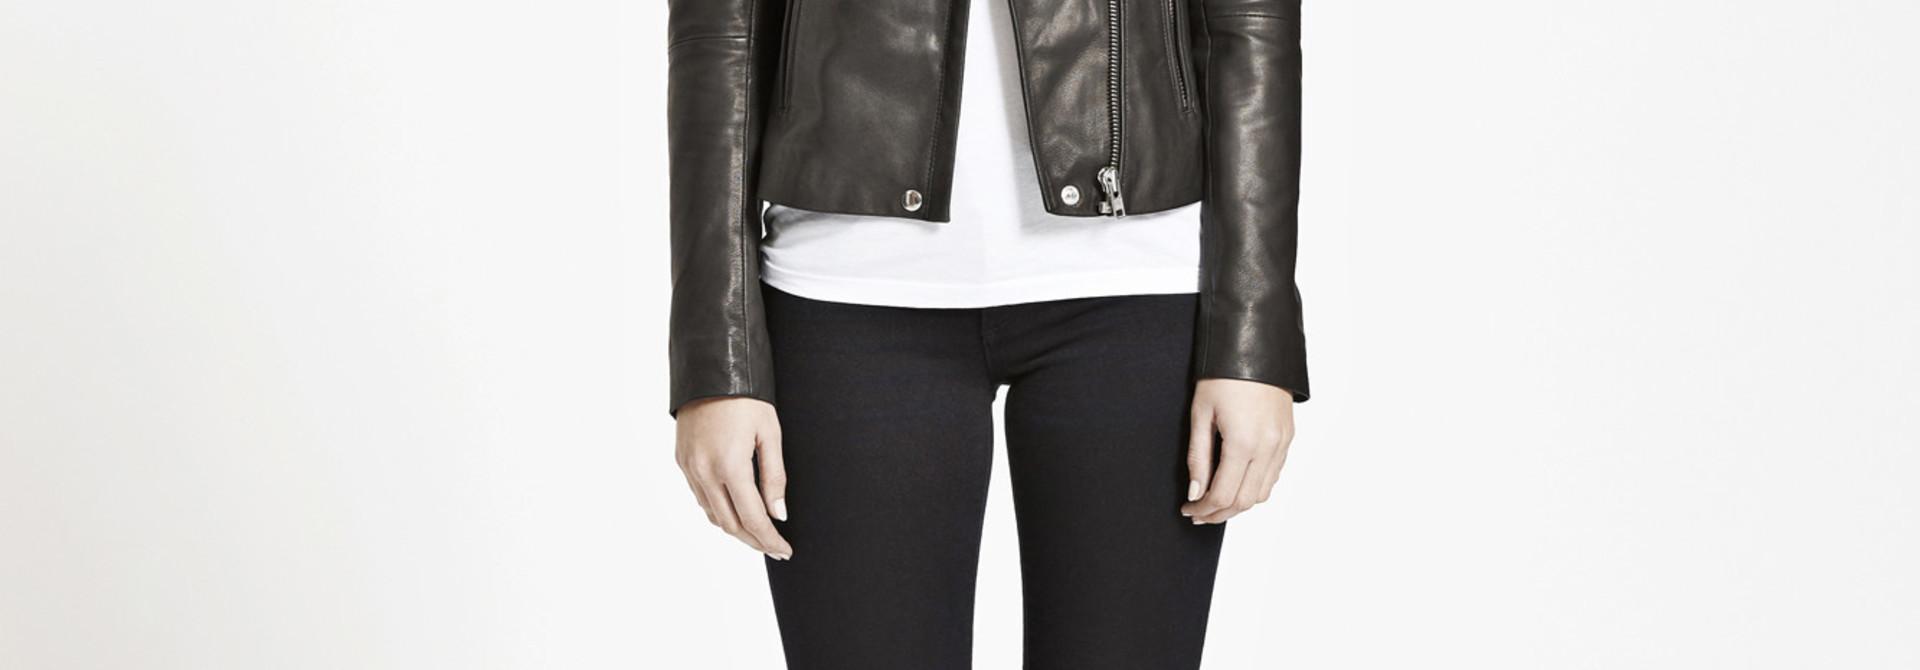 duris leather jacket Samsoe Samsoe